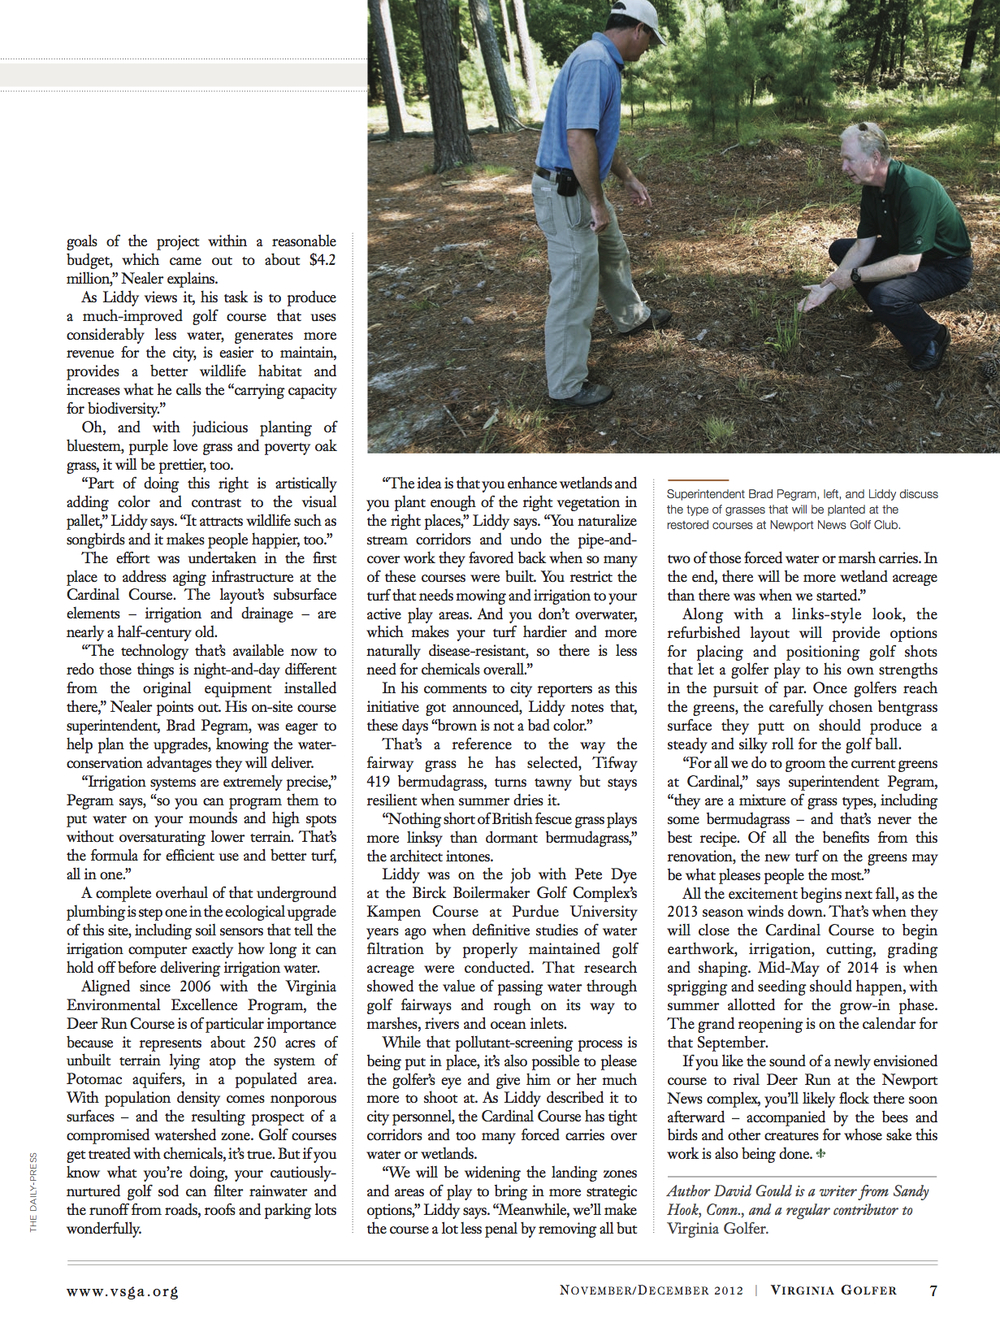 Gaining Ground by Foregoing Green Article (November December 2012 Virginia Golfer).jpg